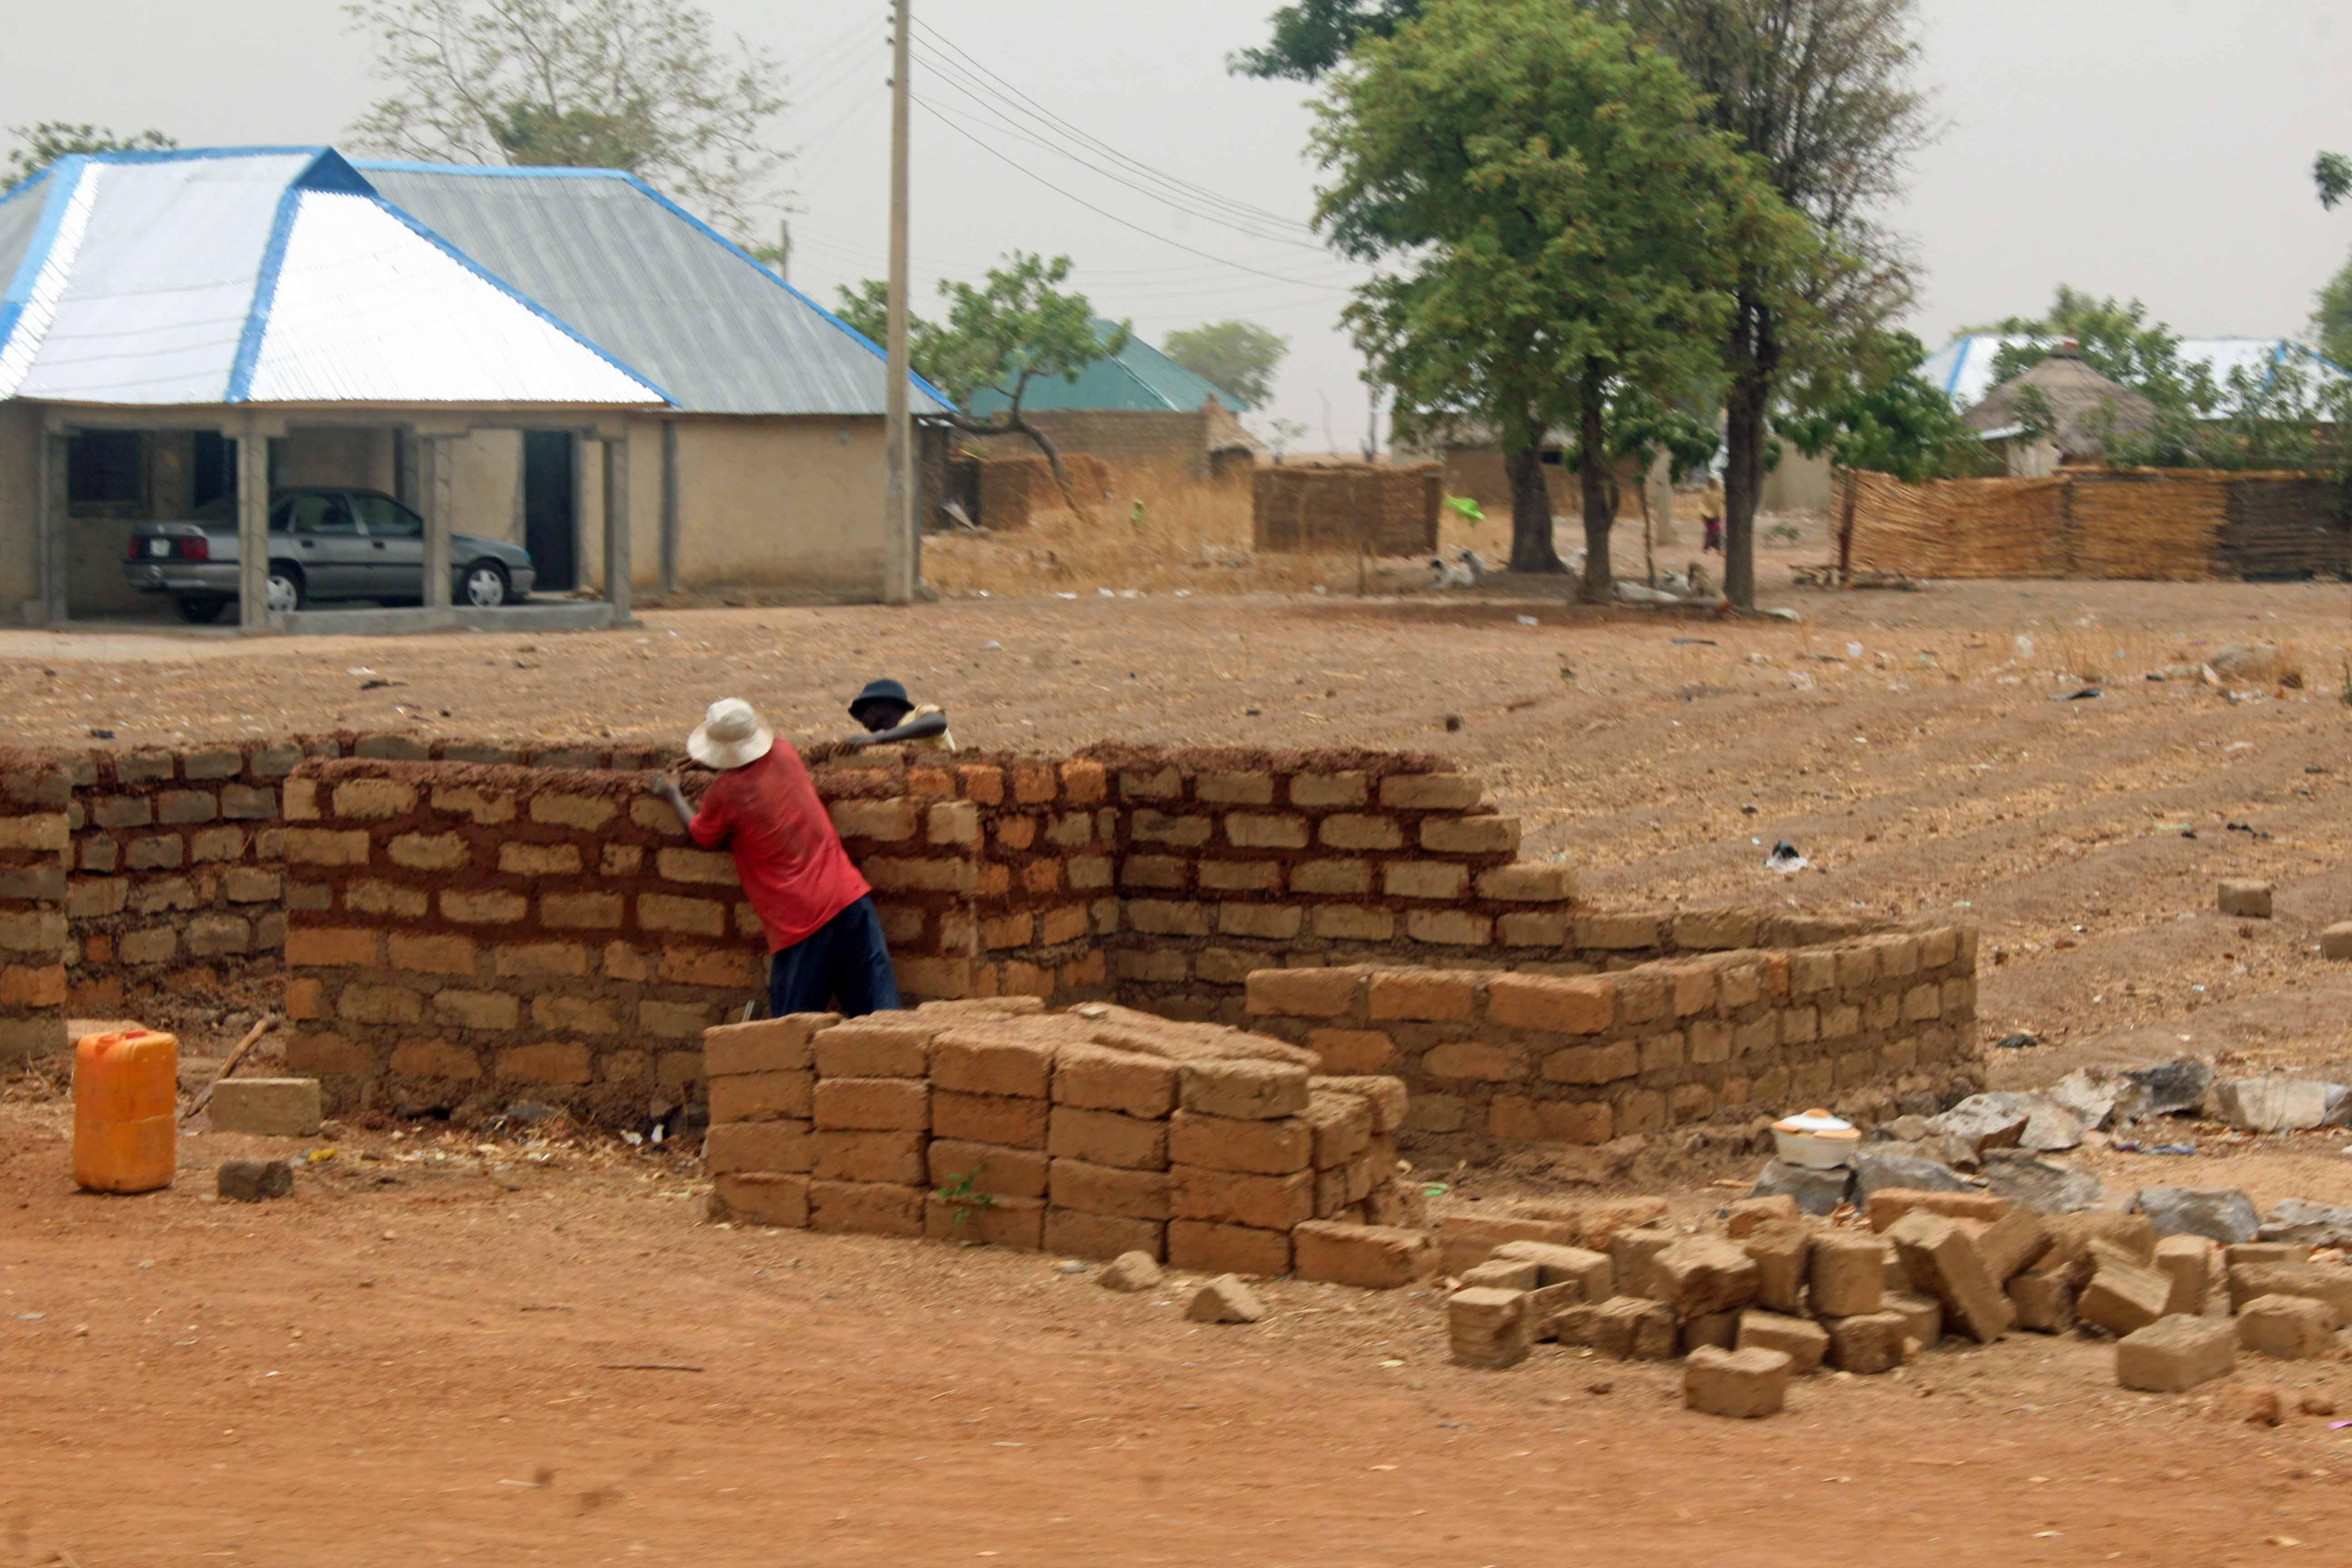 Bricklayers in Bauchi